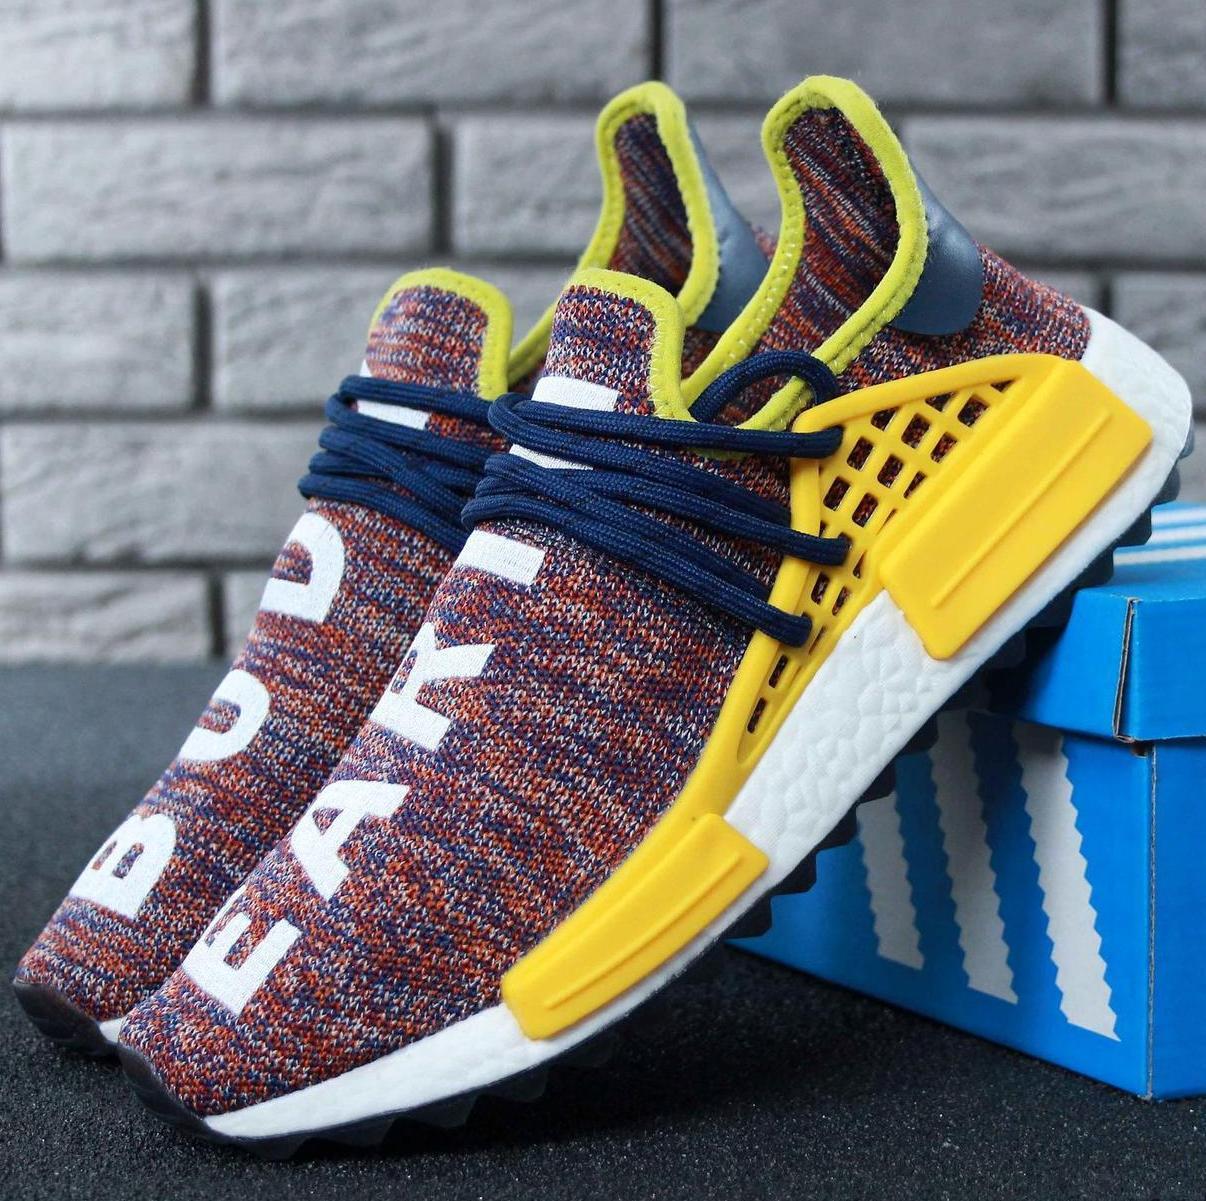 Мужские кроссовки Adidas NMD Human Race x Pharrell Williams